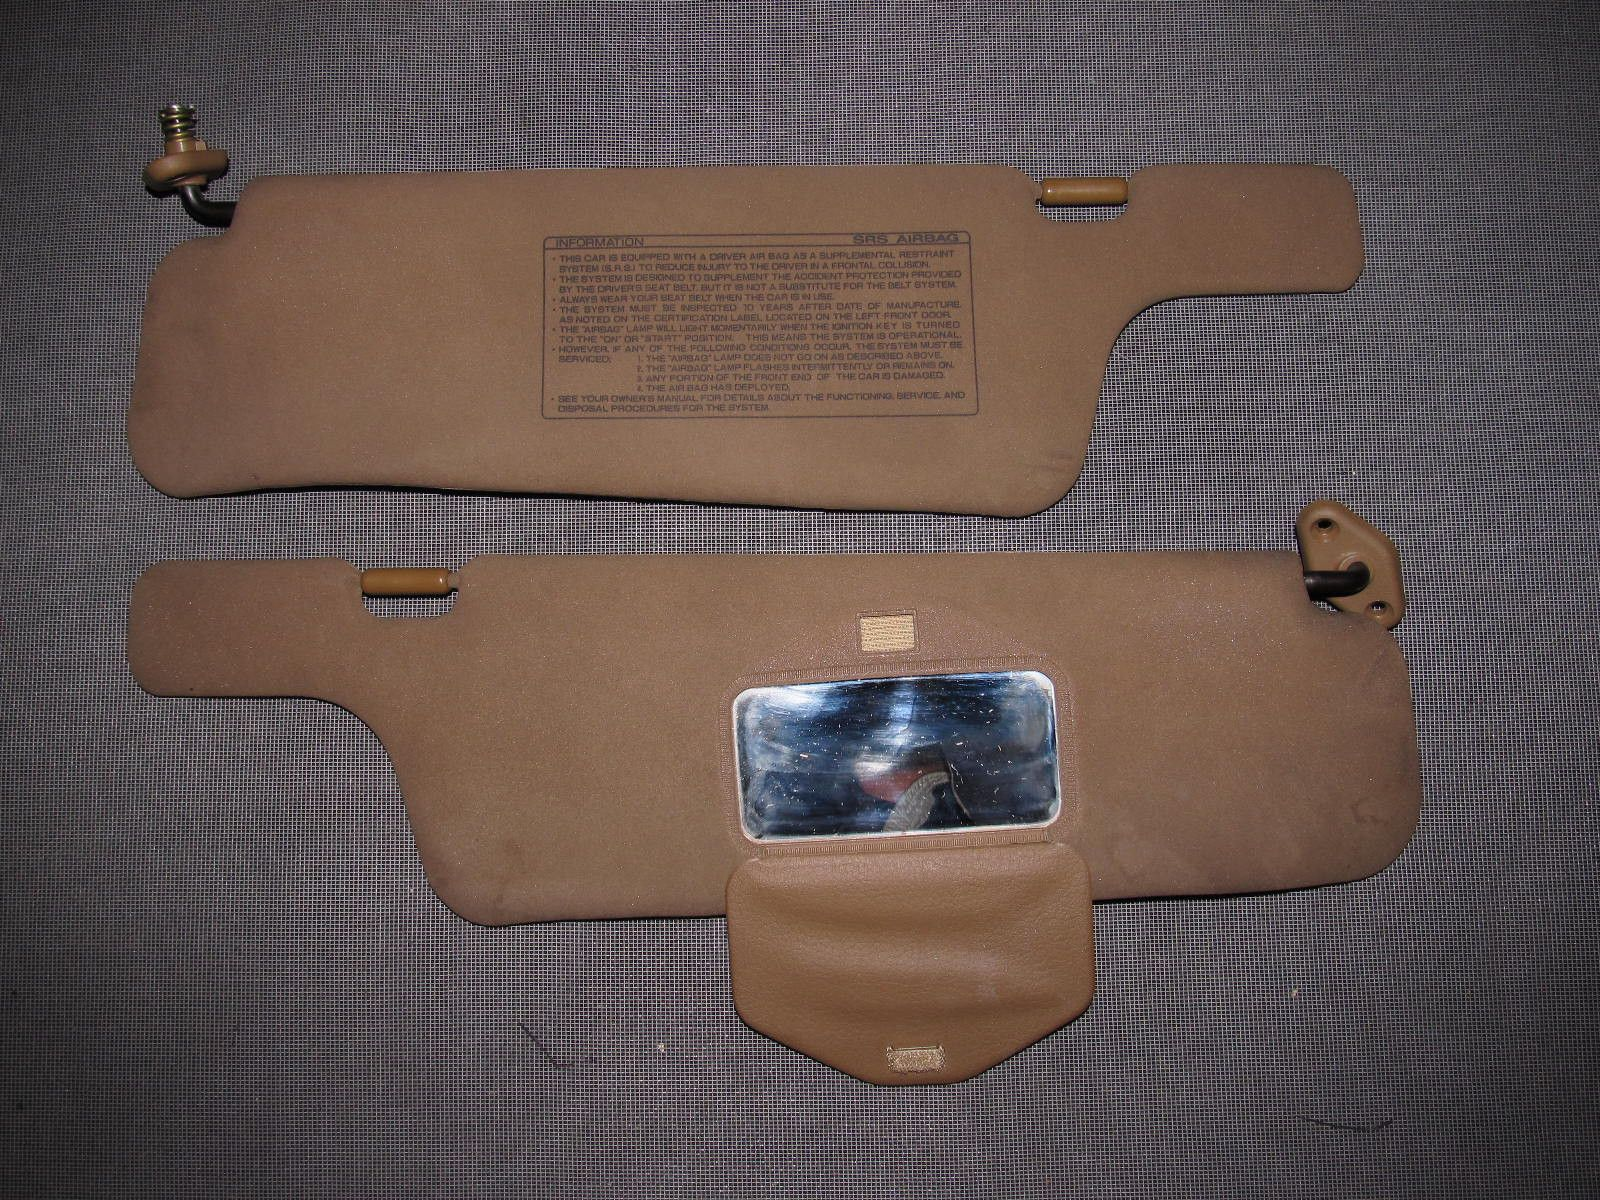 90 91 92 93 94 95 96 Nissan 300zx Oem Interior Fuse Box Detailed Sun Visor 1991 Chevy S10 Wiring Diagram Set Autopartone